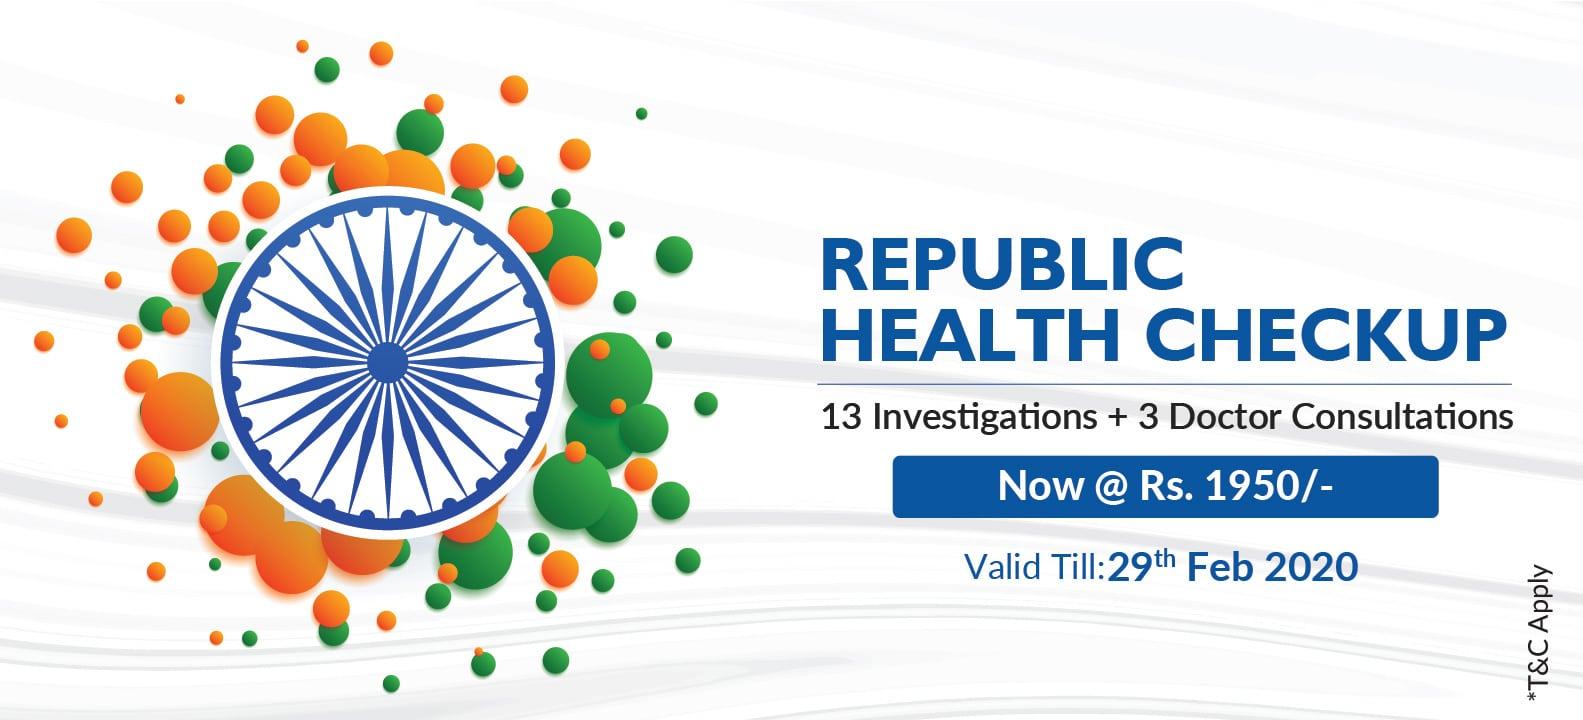 republic health checkup kurnool